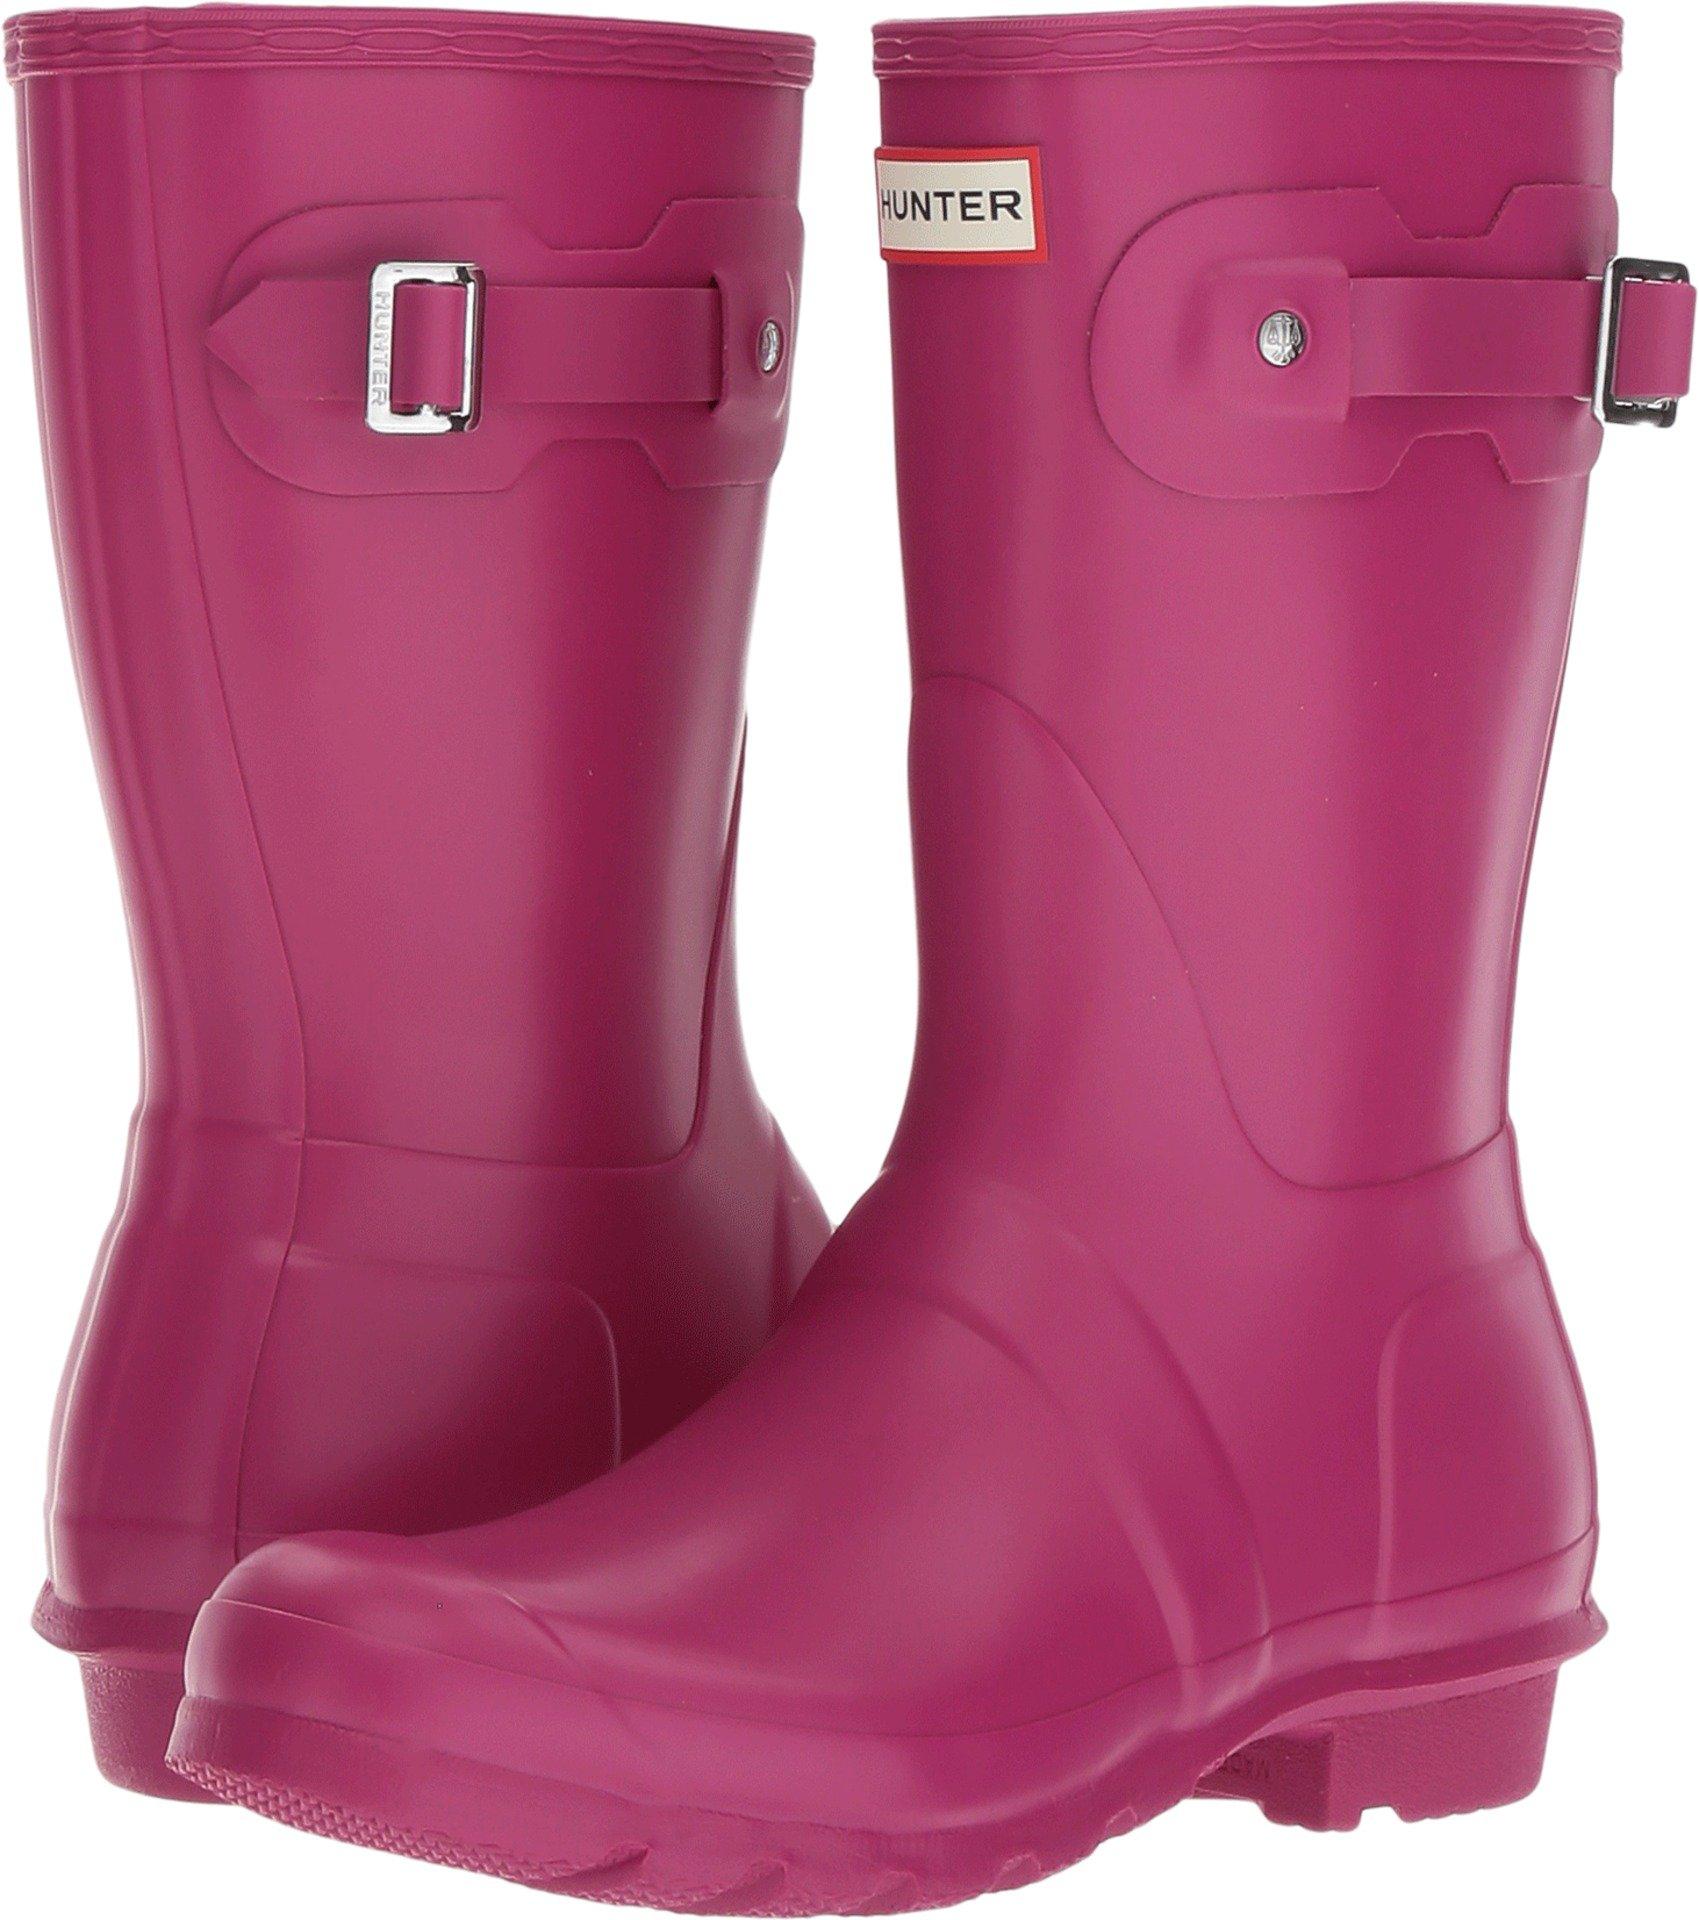 Hunter Womens Original Short Dark Ion Pink Rain Boot - 5 B(M) US by Hunter